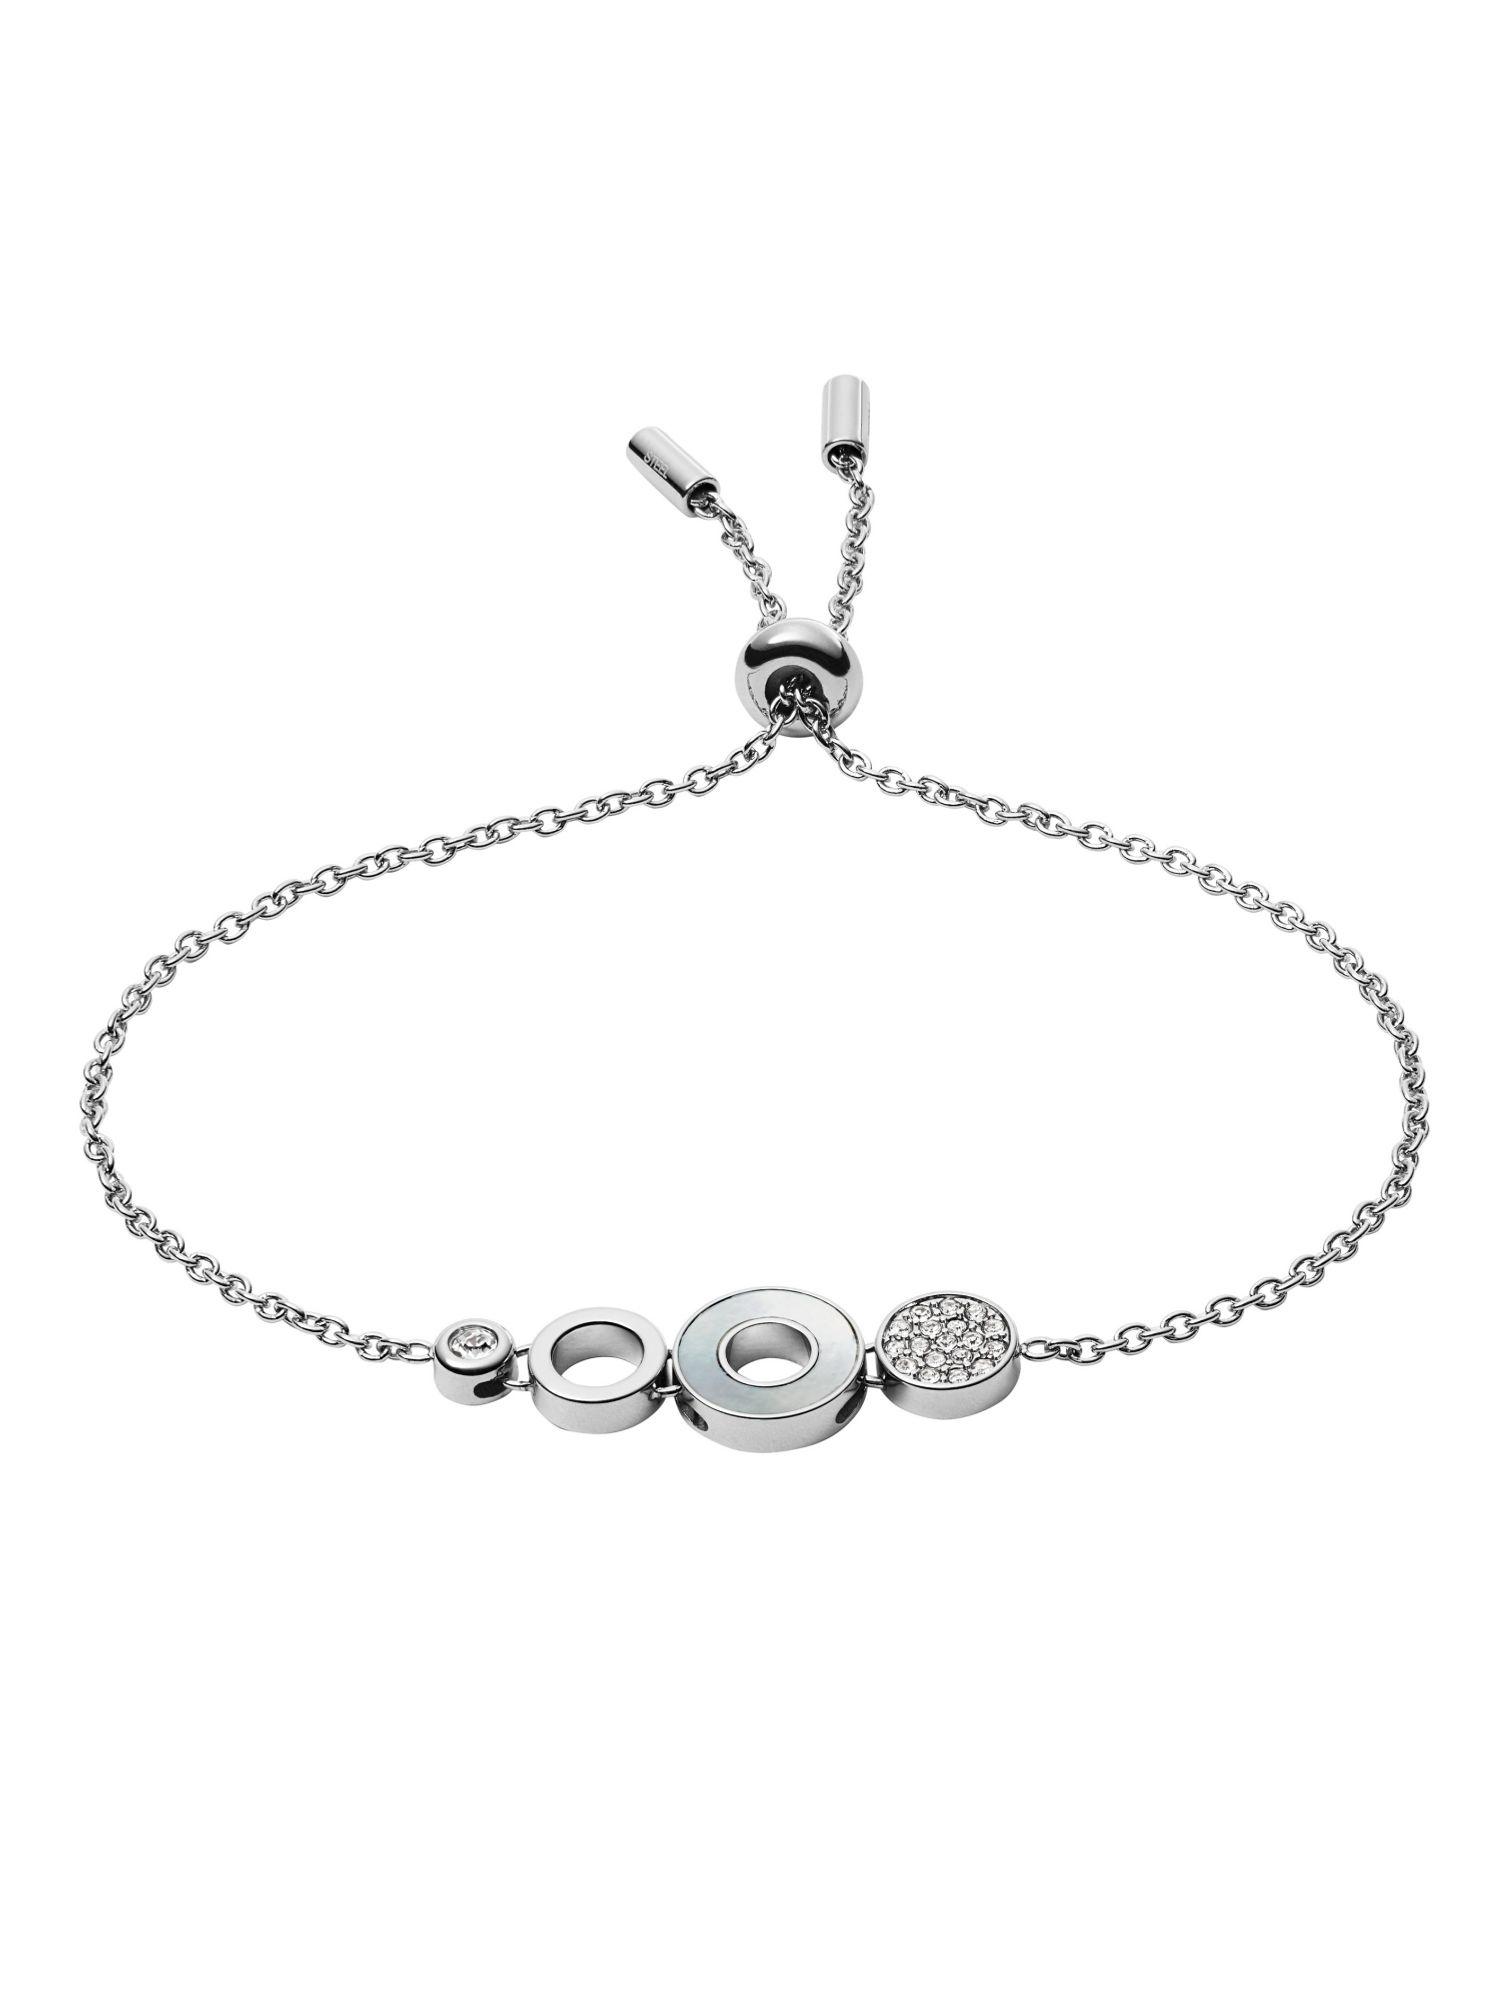 Fossil JF03141040 Damen Armband Edelstahl Silber Weiß 22 cm